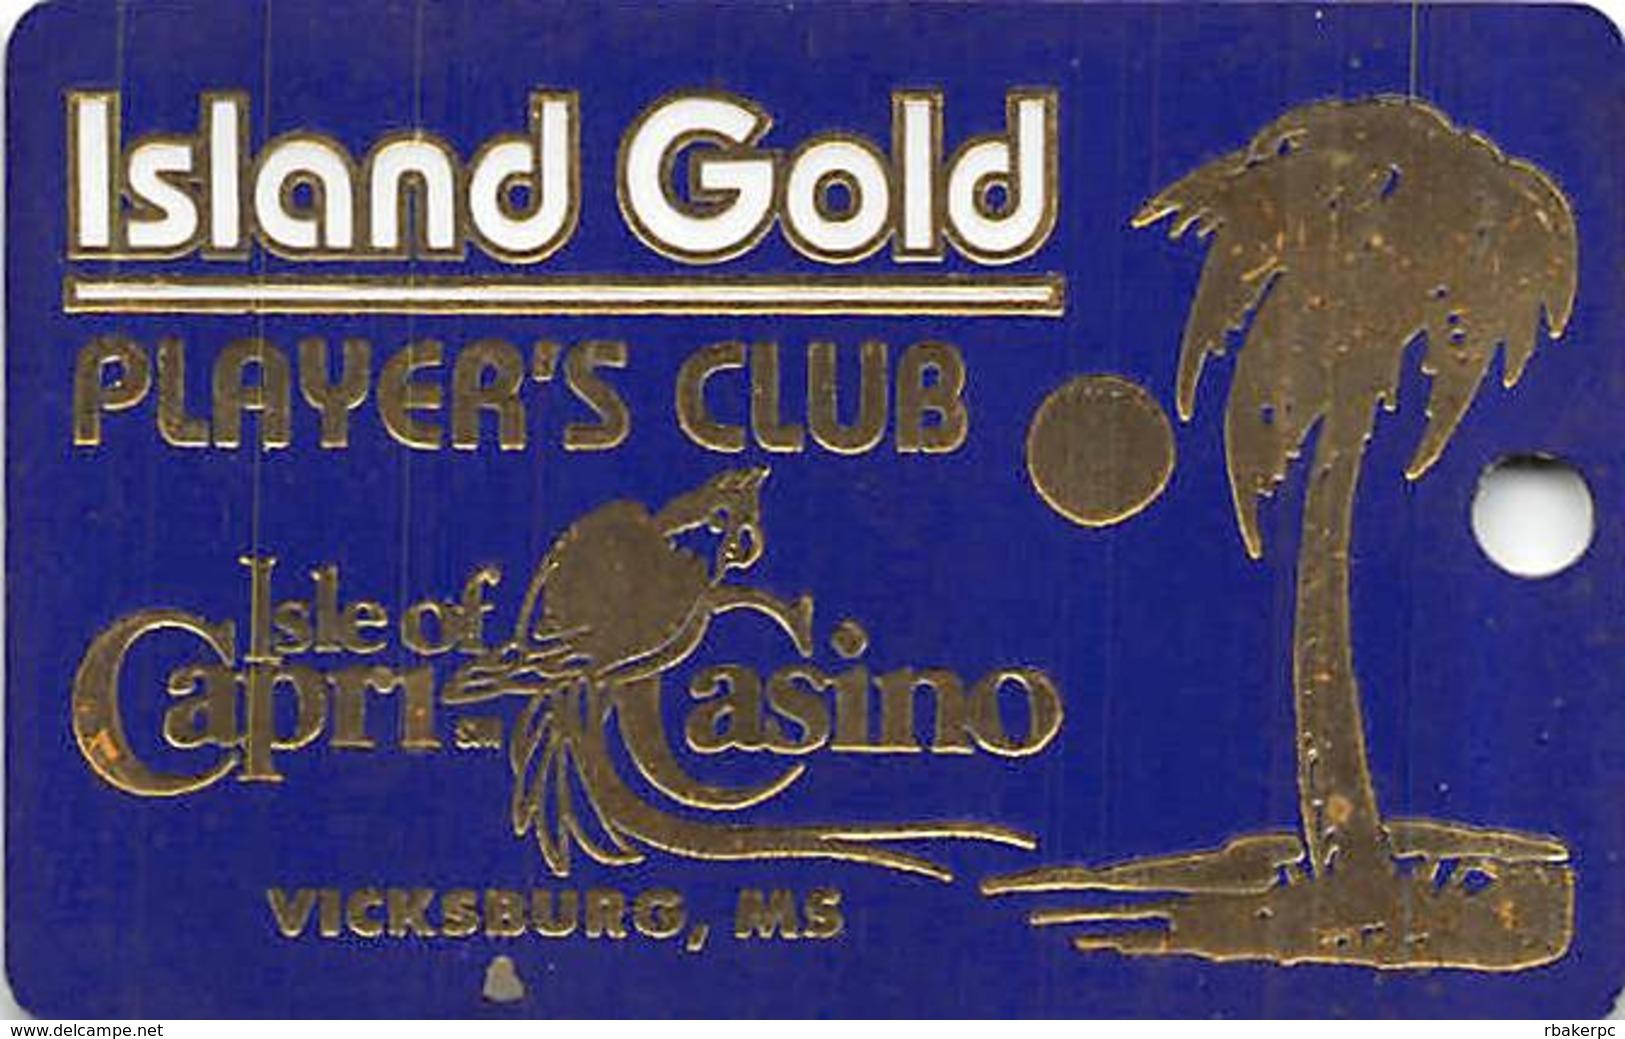 Isle Of Capri Casino - Vicksburg, MS - Luggage Tag / Dangle - Casino Cards